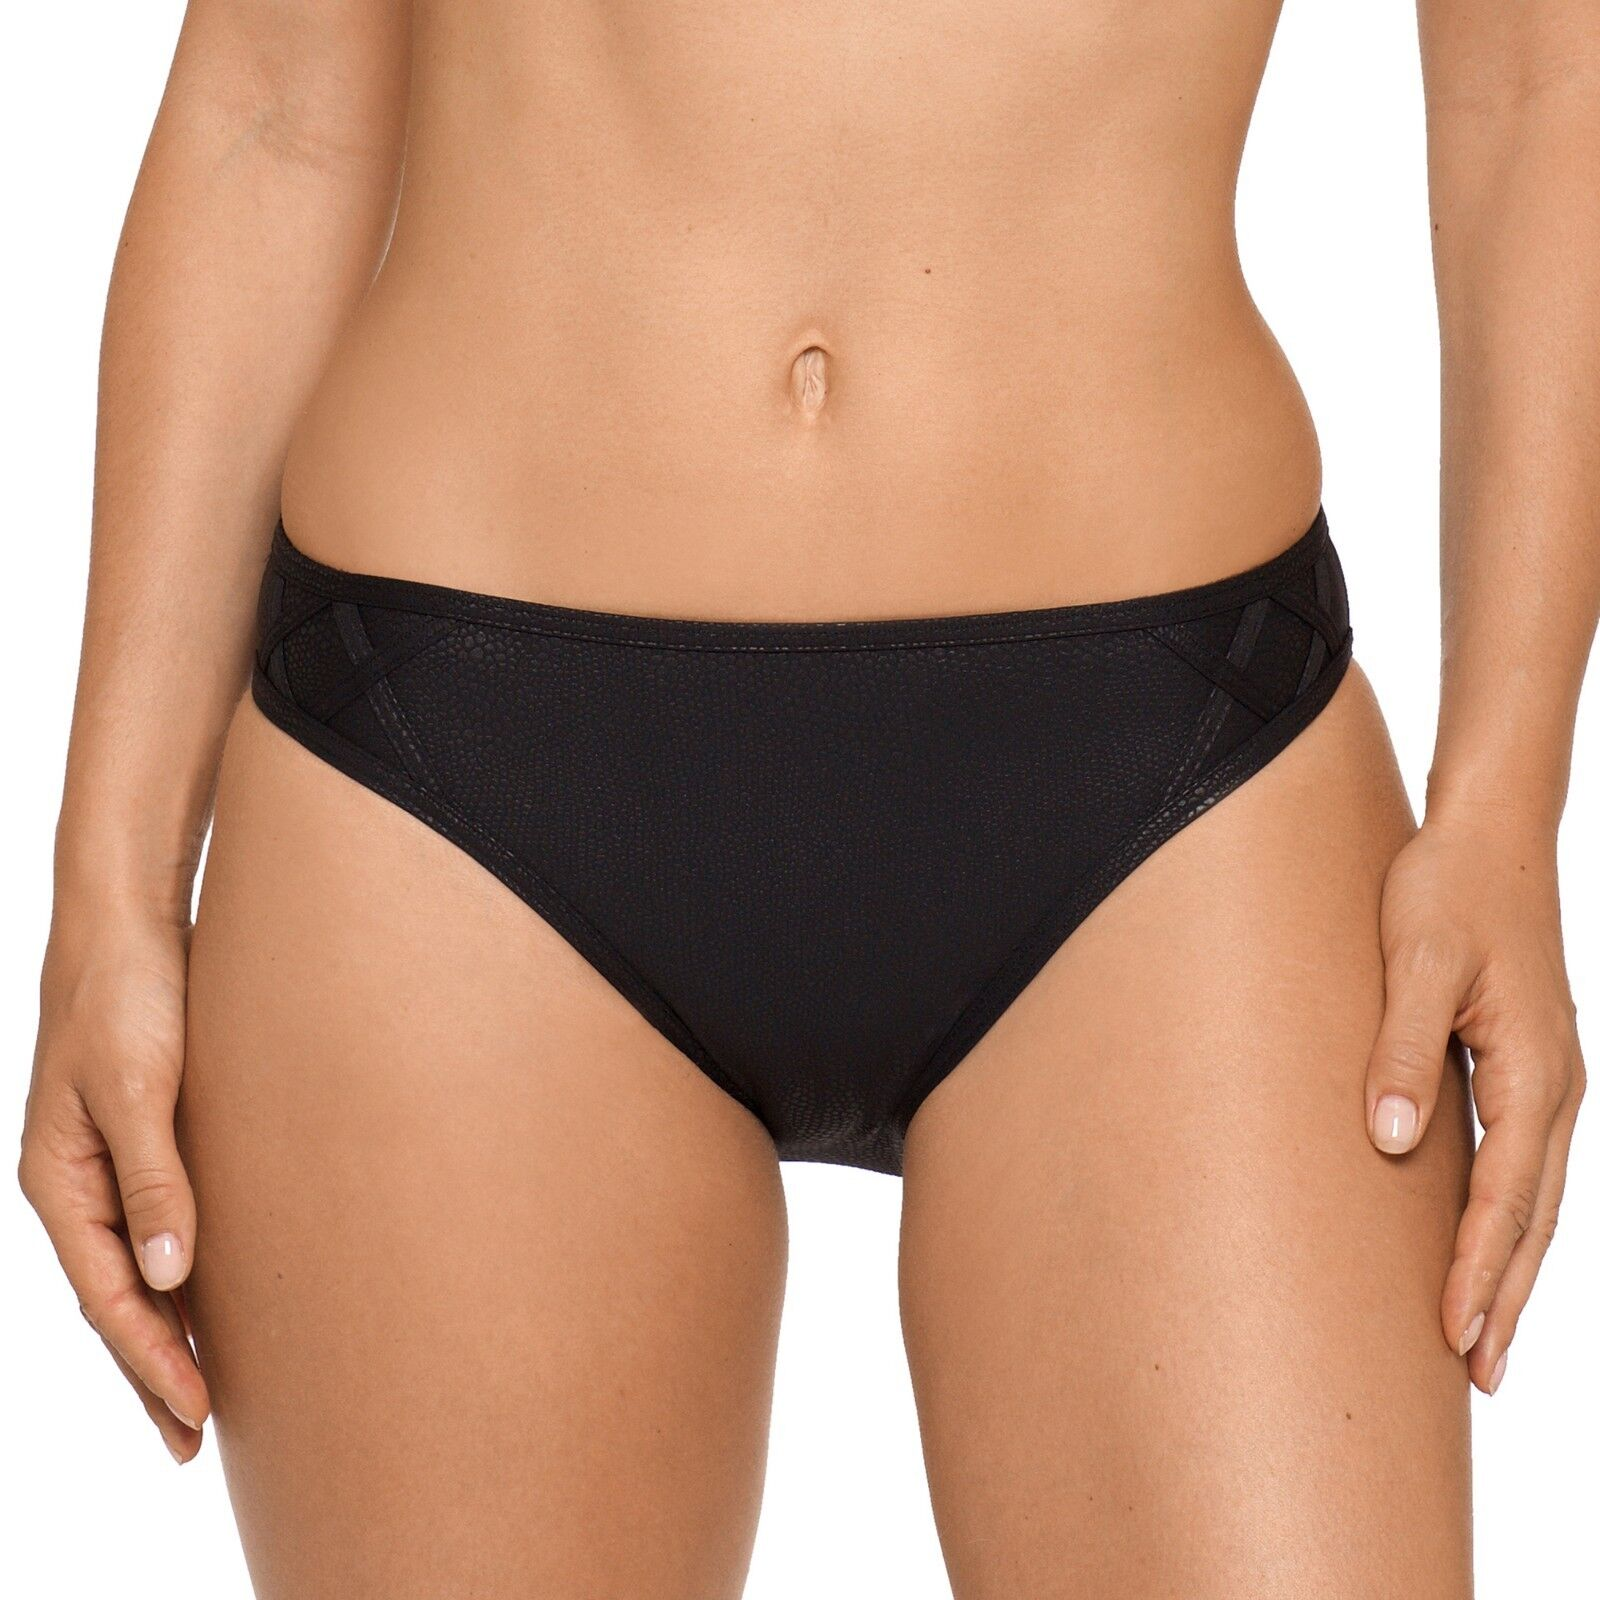 Prima damen Swim Freedom Freedom Freedom Bikini Slip Schwarz Rioslip Hose 4004450   Qualitativ Hochwertiges Produkt    Sonderpreis    Qualitätsprodukte  fe66be